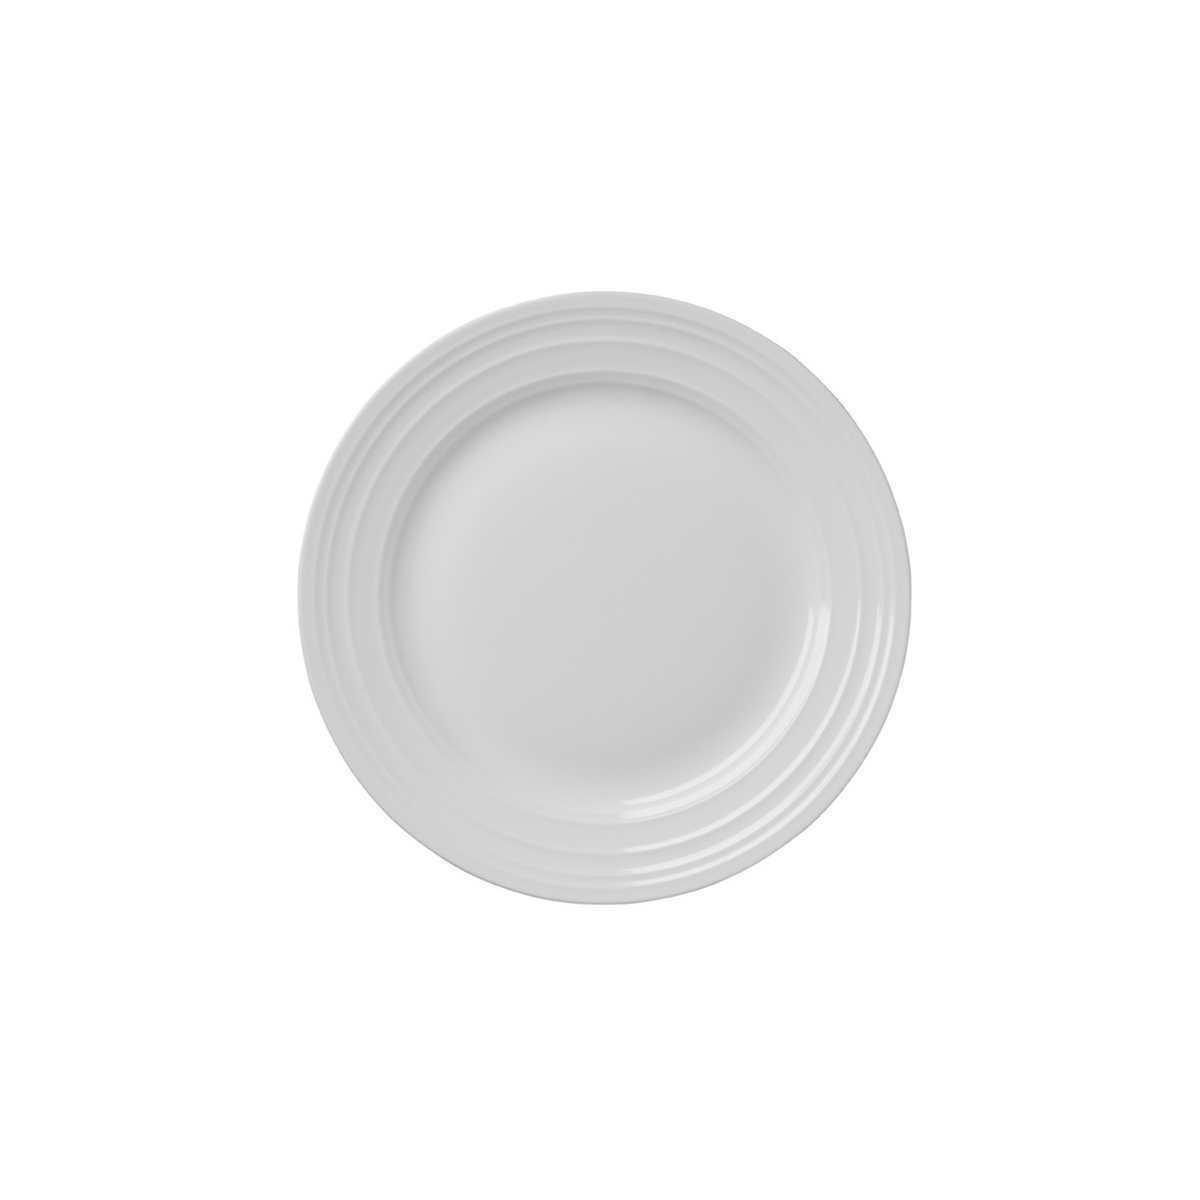 Mikasa Swirl Dinnerware Services Bowls